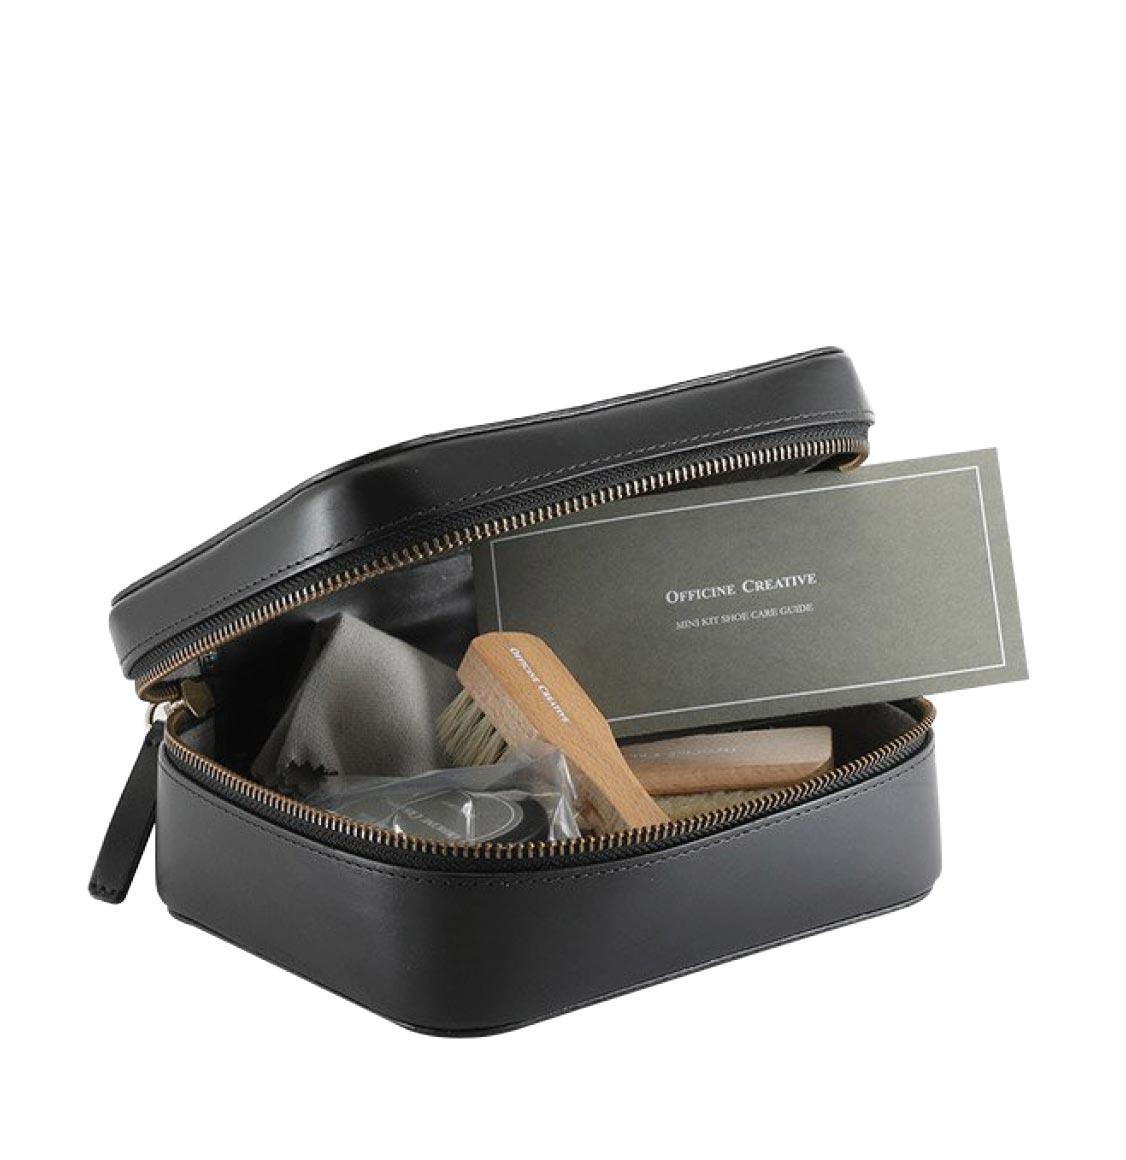 Officine Creative Shoecare Travel Kit Black Fine Shoe Cream 65g | Shoe Fibre | Two High-Quality Shoe Brushes | Black Leather Shoehorn